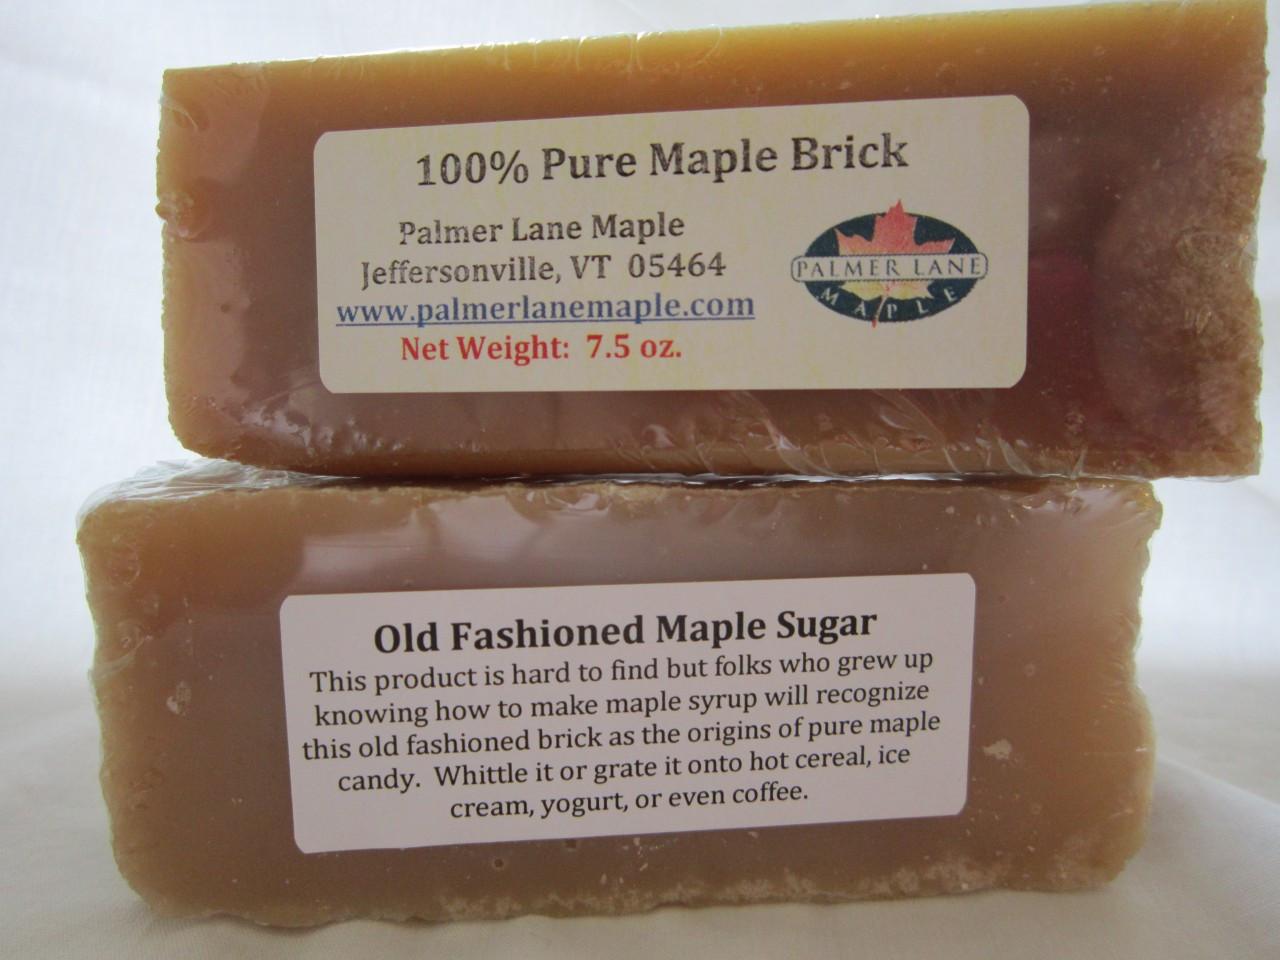 eea8440c274 Maple Sugar Candy - 7.5 oz. Pure Maple Brick - Palmer Lane Maple LLC